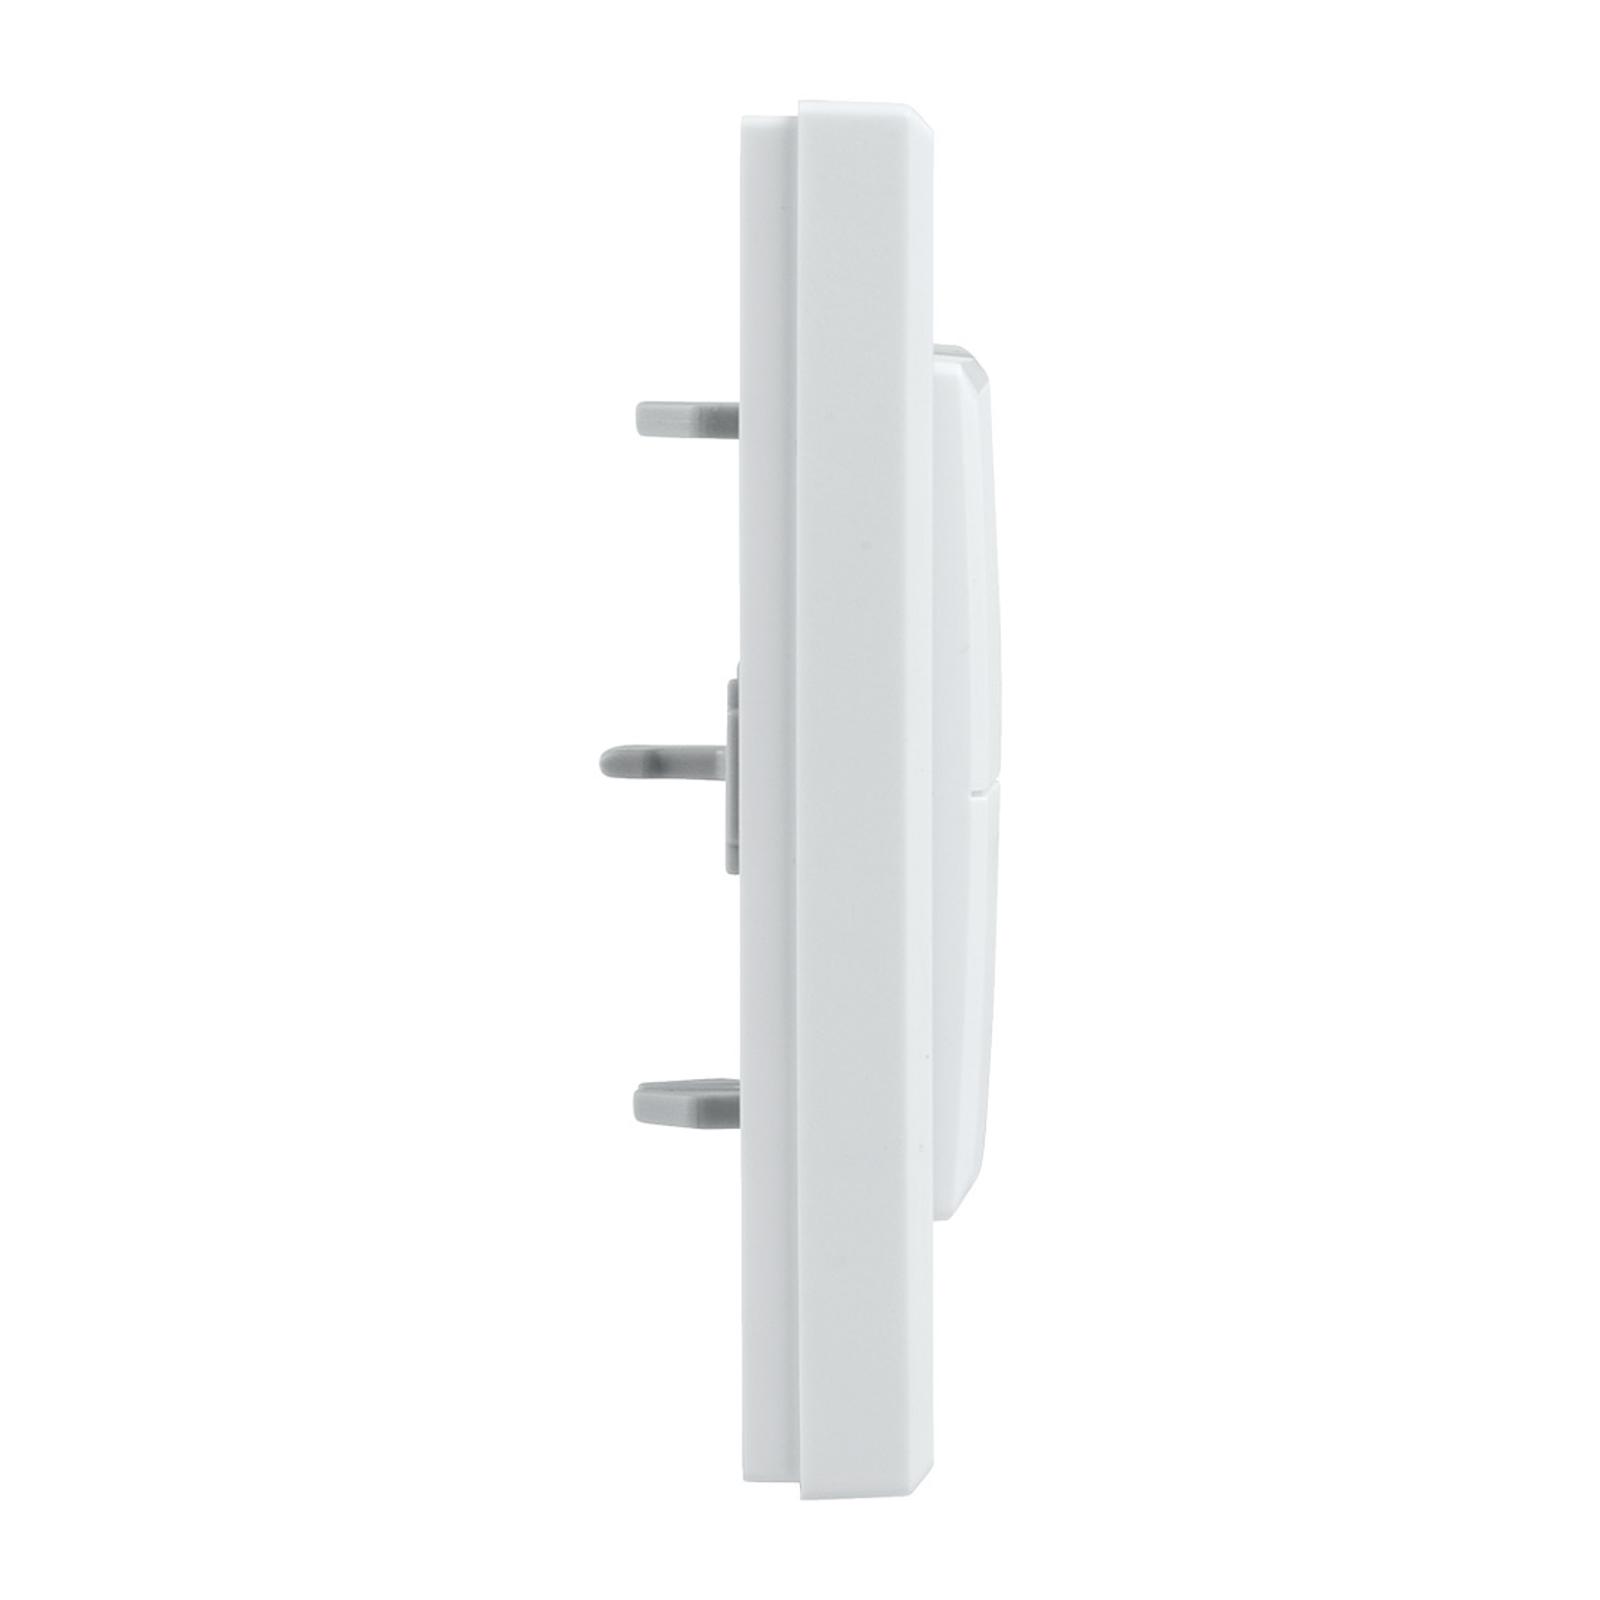 Homematic IP bascule interrupteur marque, flèche